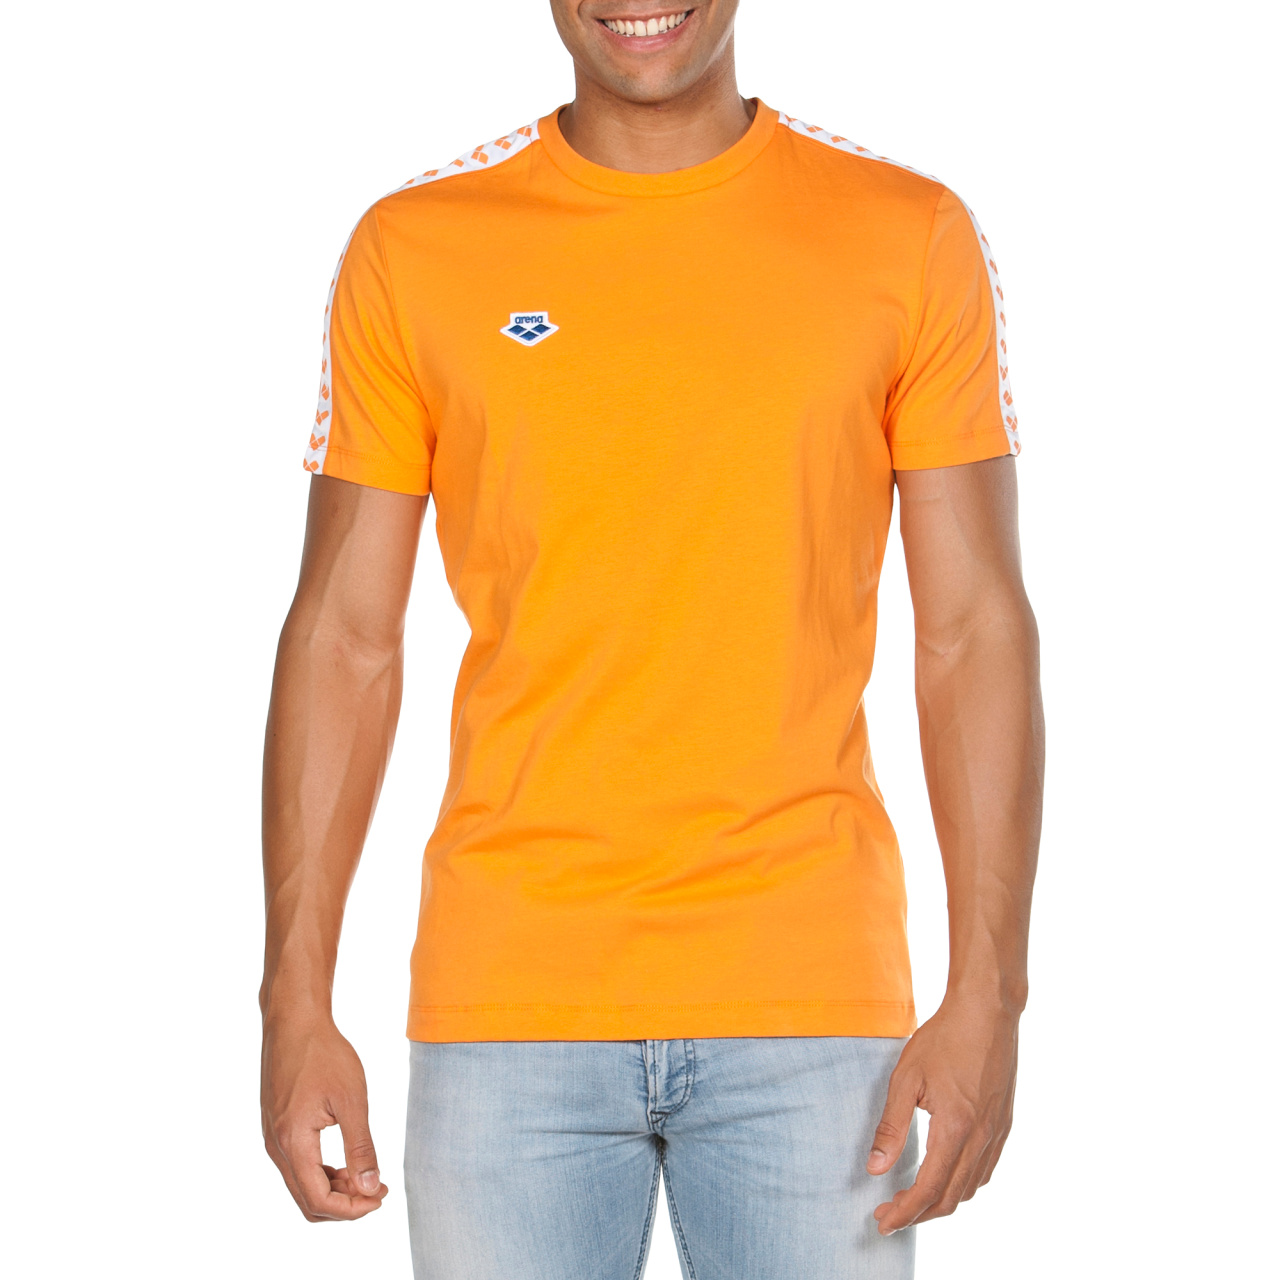 Camiseta Icons arena para Hombre Relax Team_6767